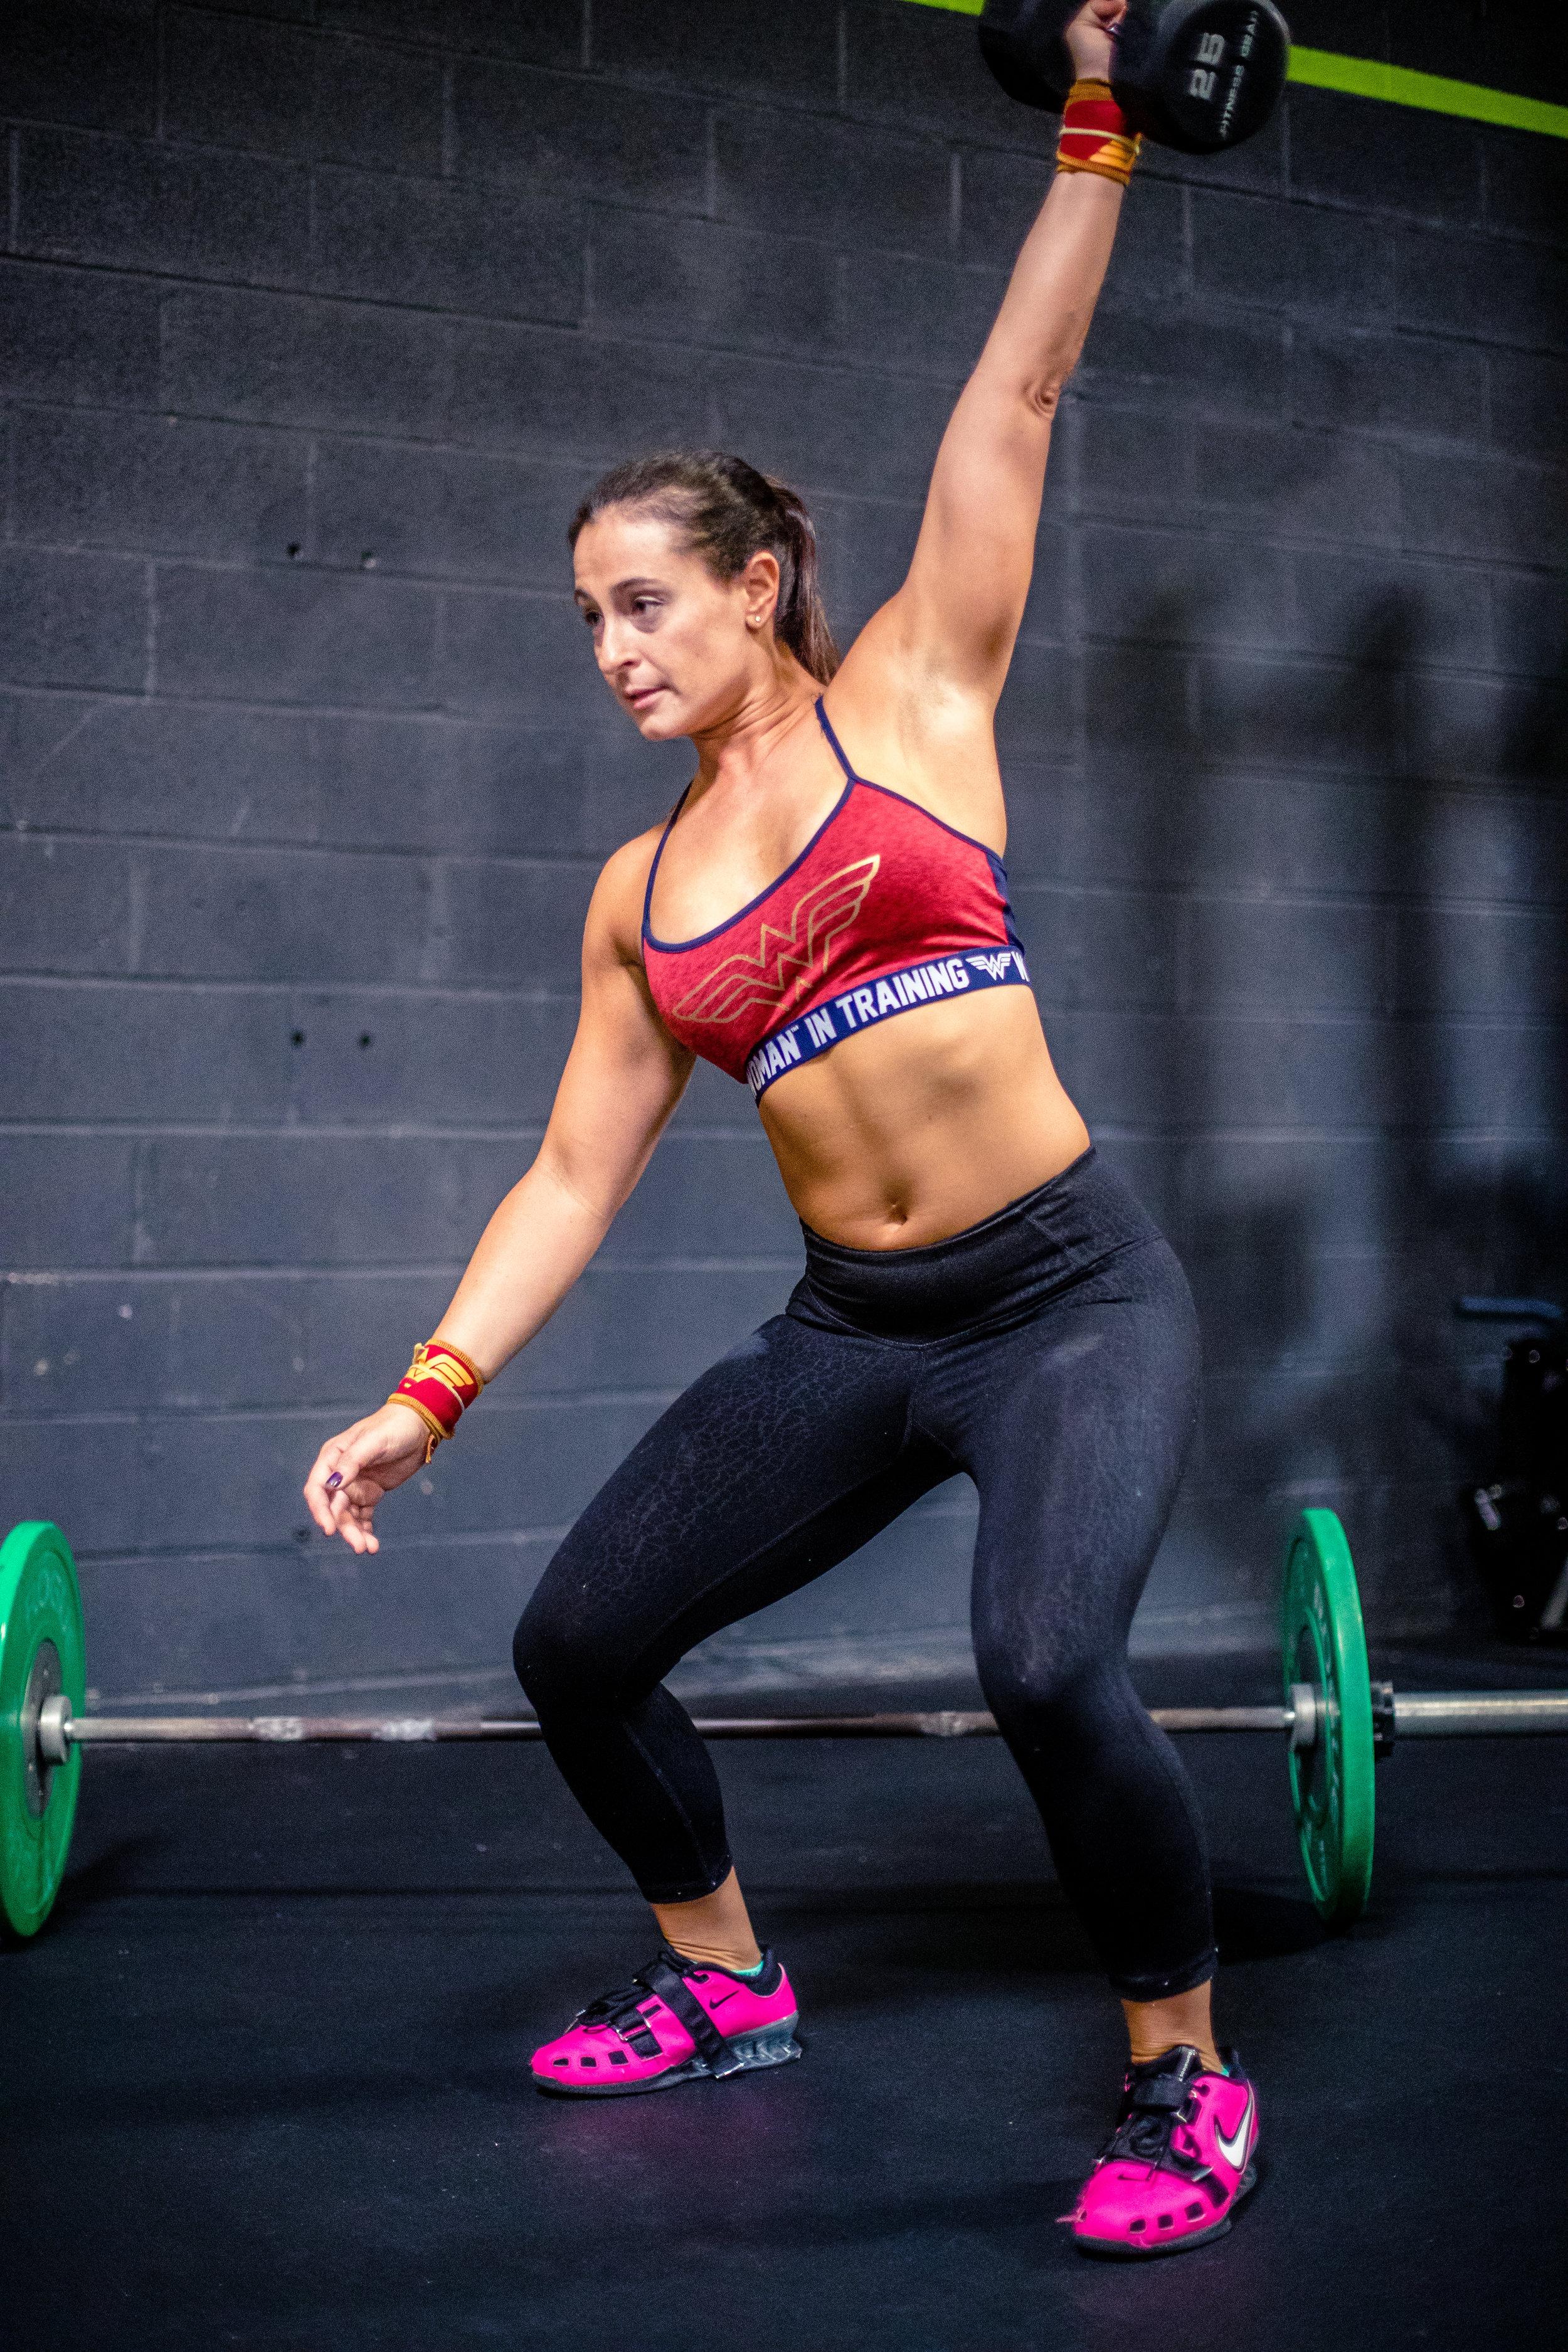 pink-nike-romelos-weightlifting-shoes-rogue-crossfit.jpg